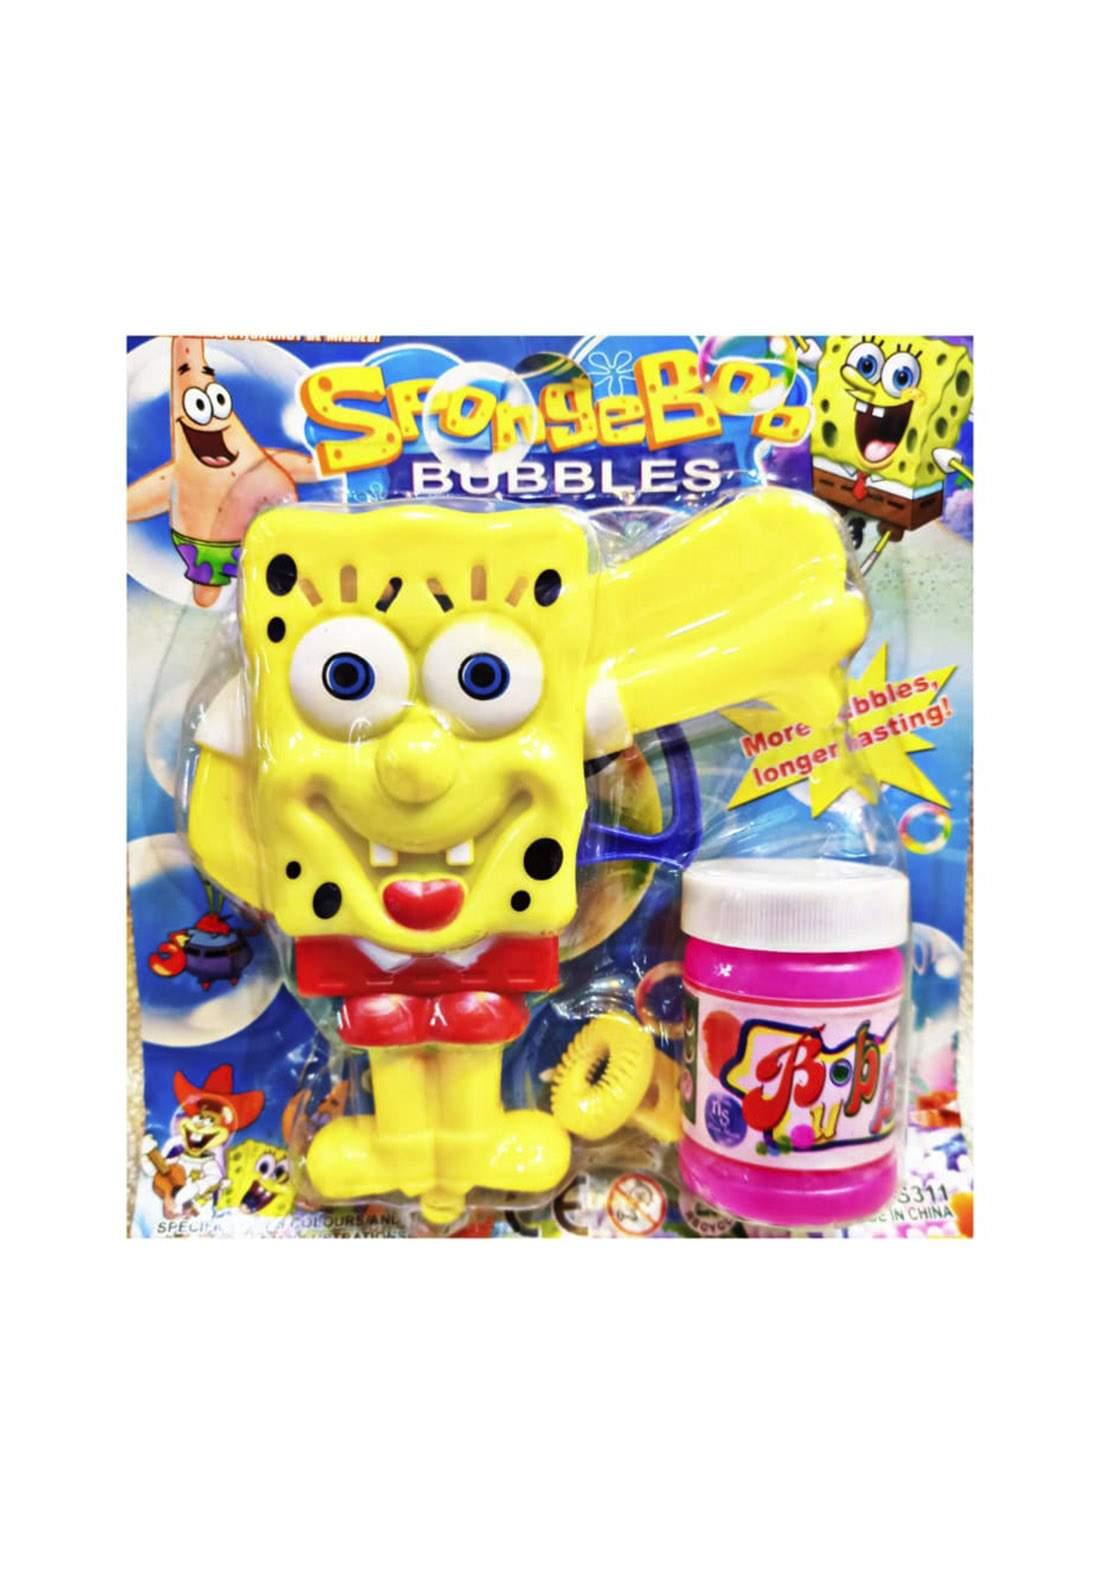 Sponge Boo Bubbles Gun for kids لعبة للأطفال